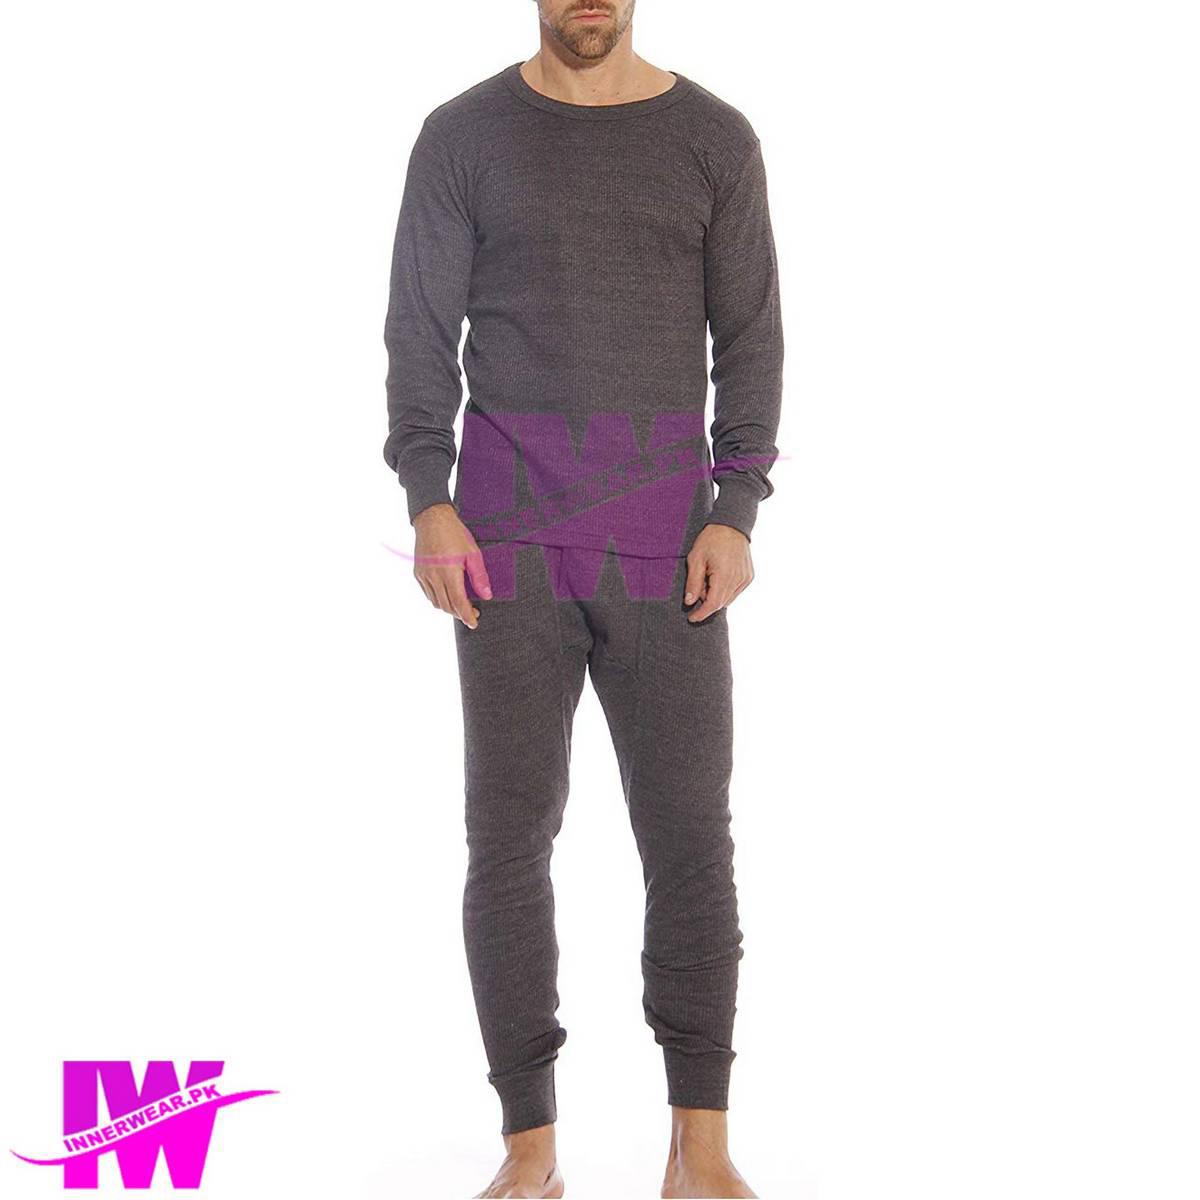 Men Premium Full Body Suit Thermal Body Warmer Skin Tight Stretchable Innerwear Winter Warm Long Johns Trouser Pajama Full Sleeve Shirt Dark Grey